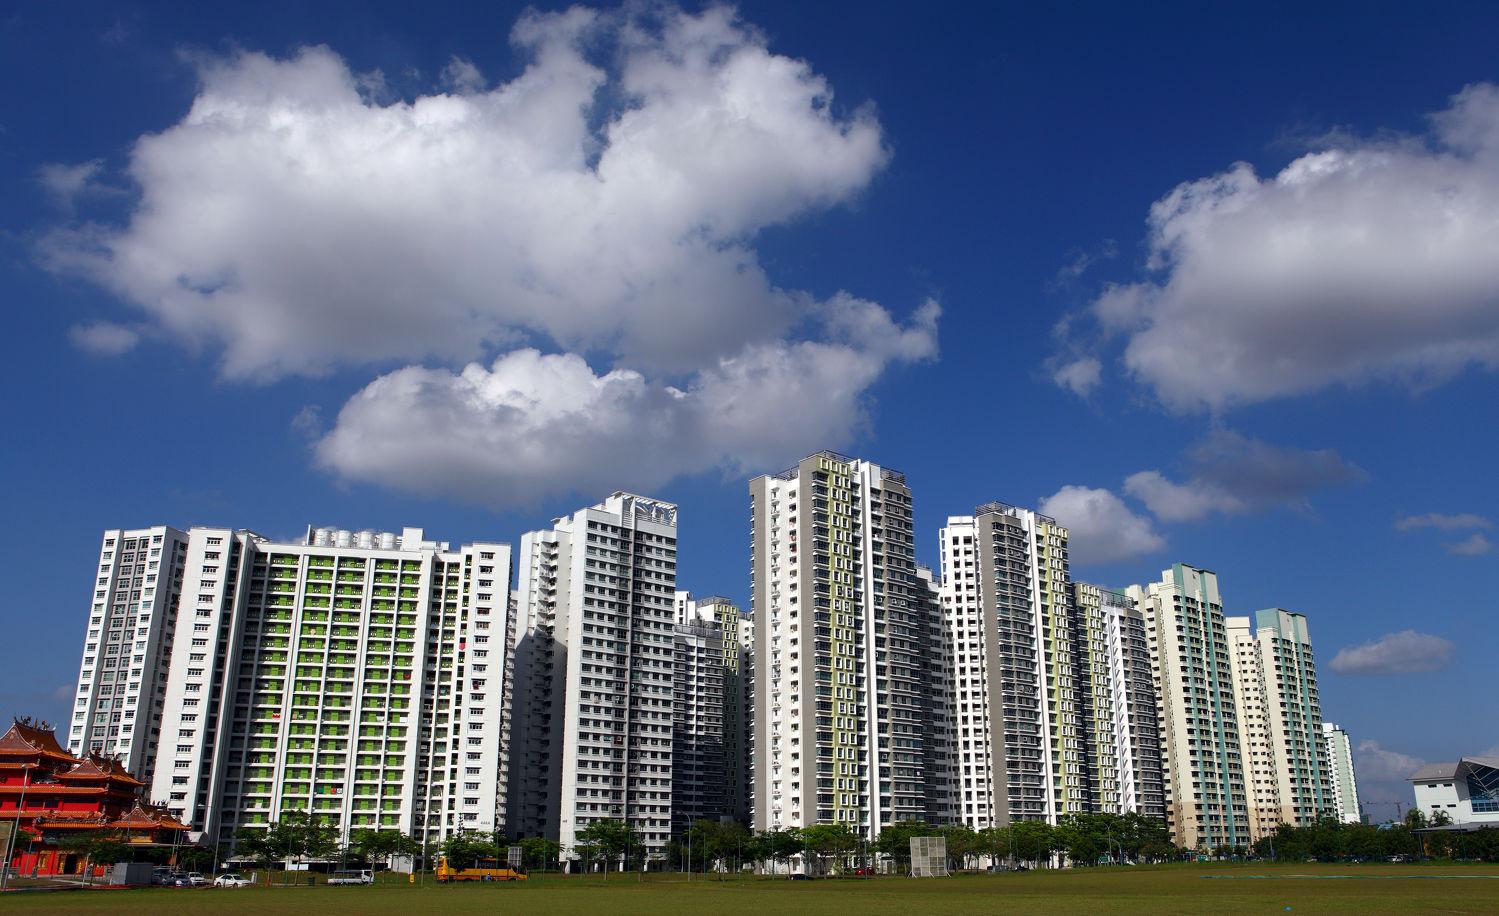 fernvale lane - EDGEPROP SINGAPORE